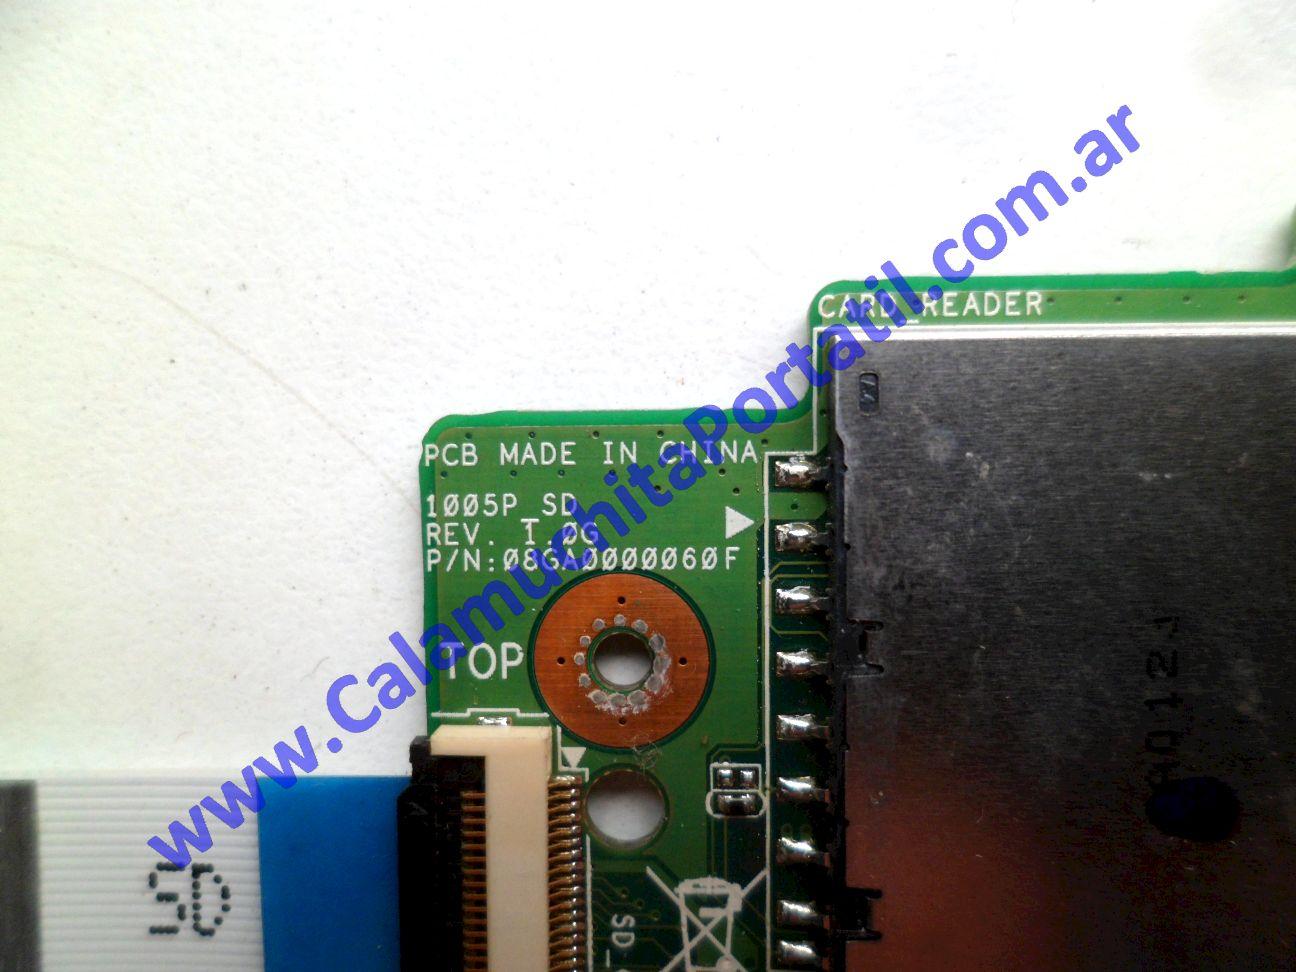 0576PLE Placa Leds Asus Eee PC 1005PE